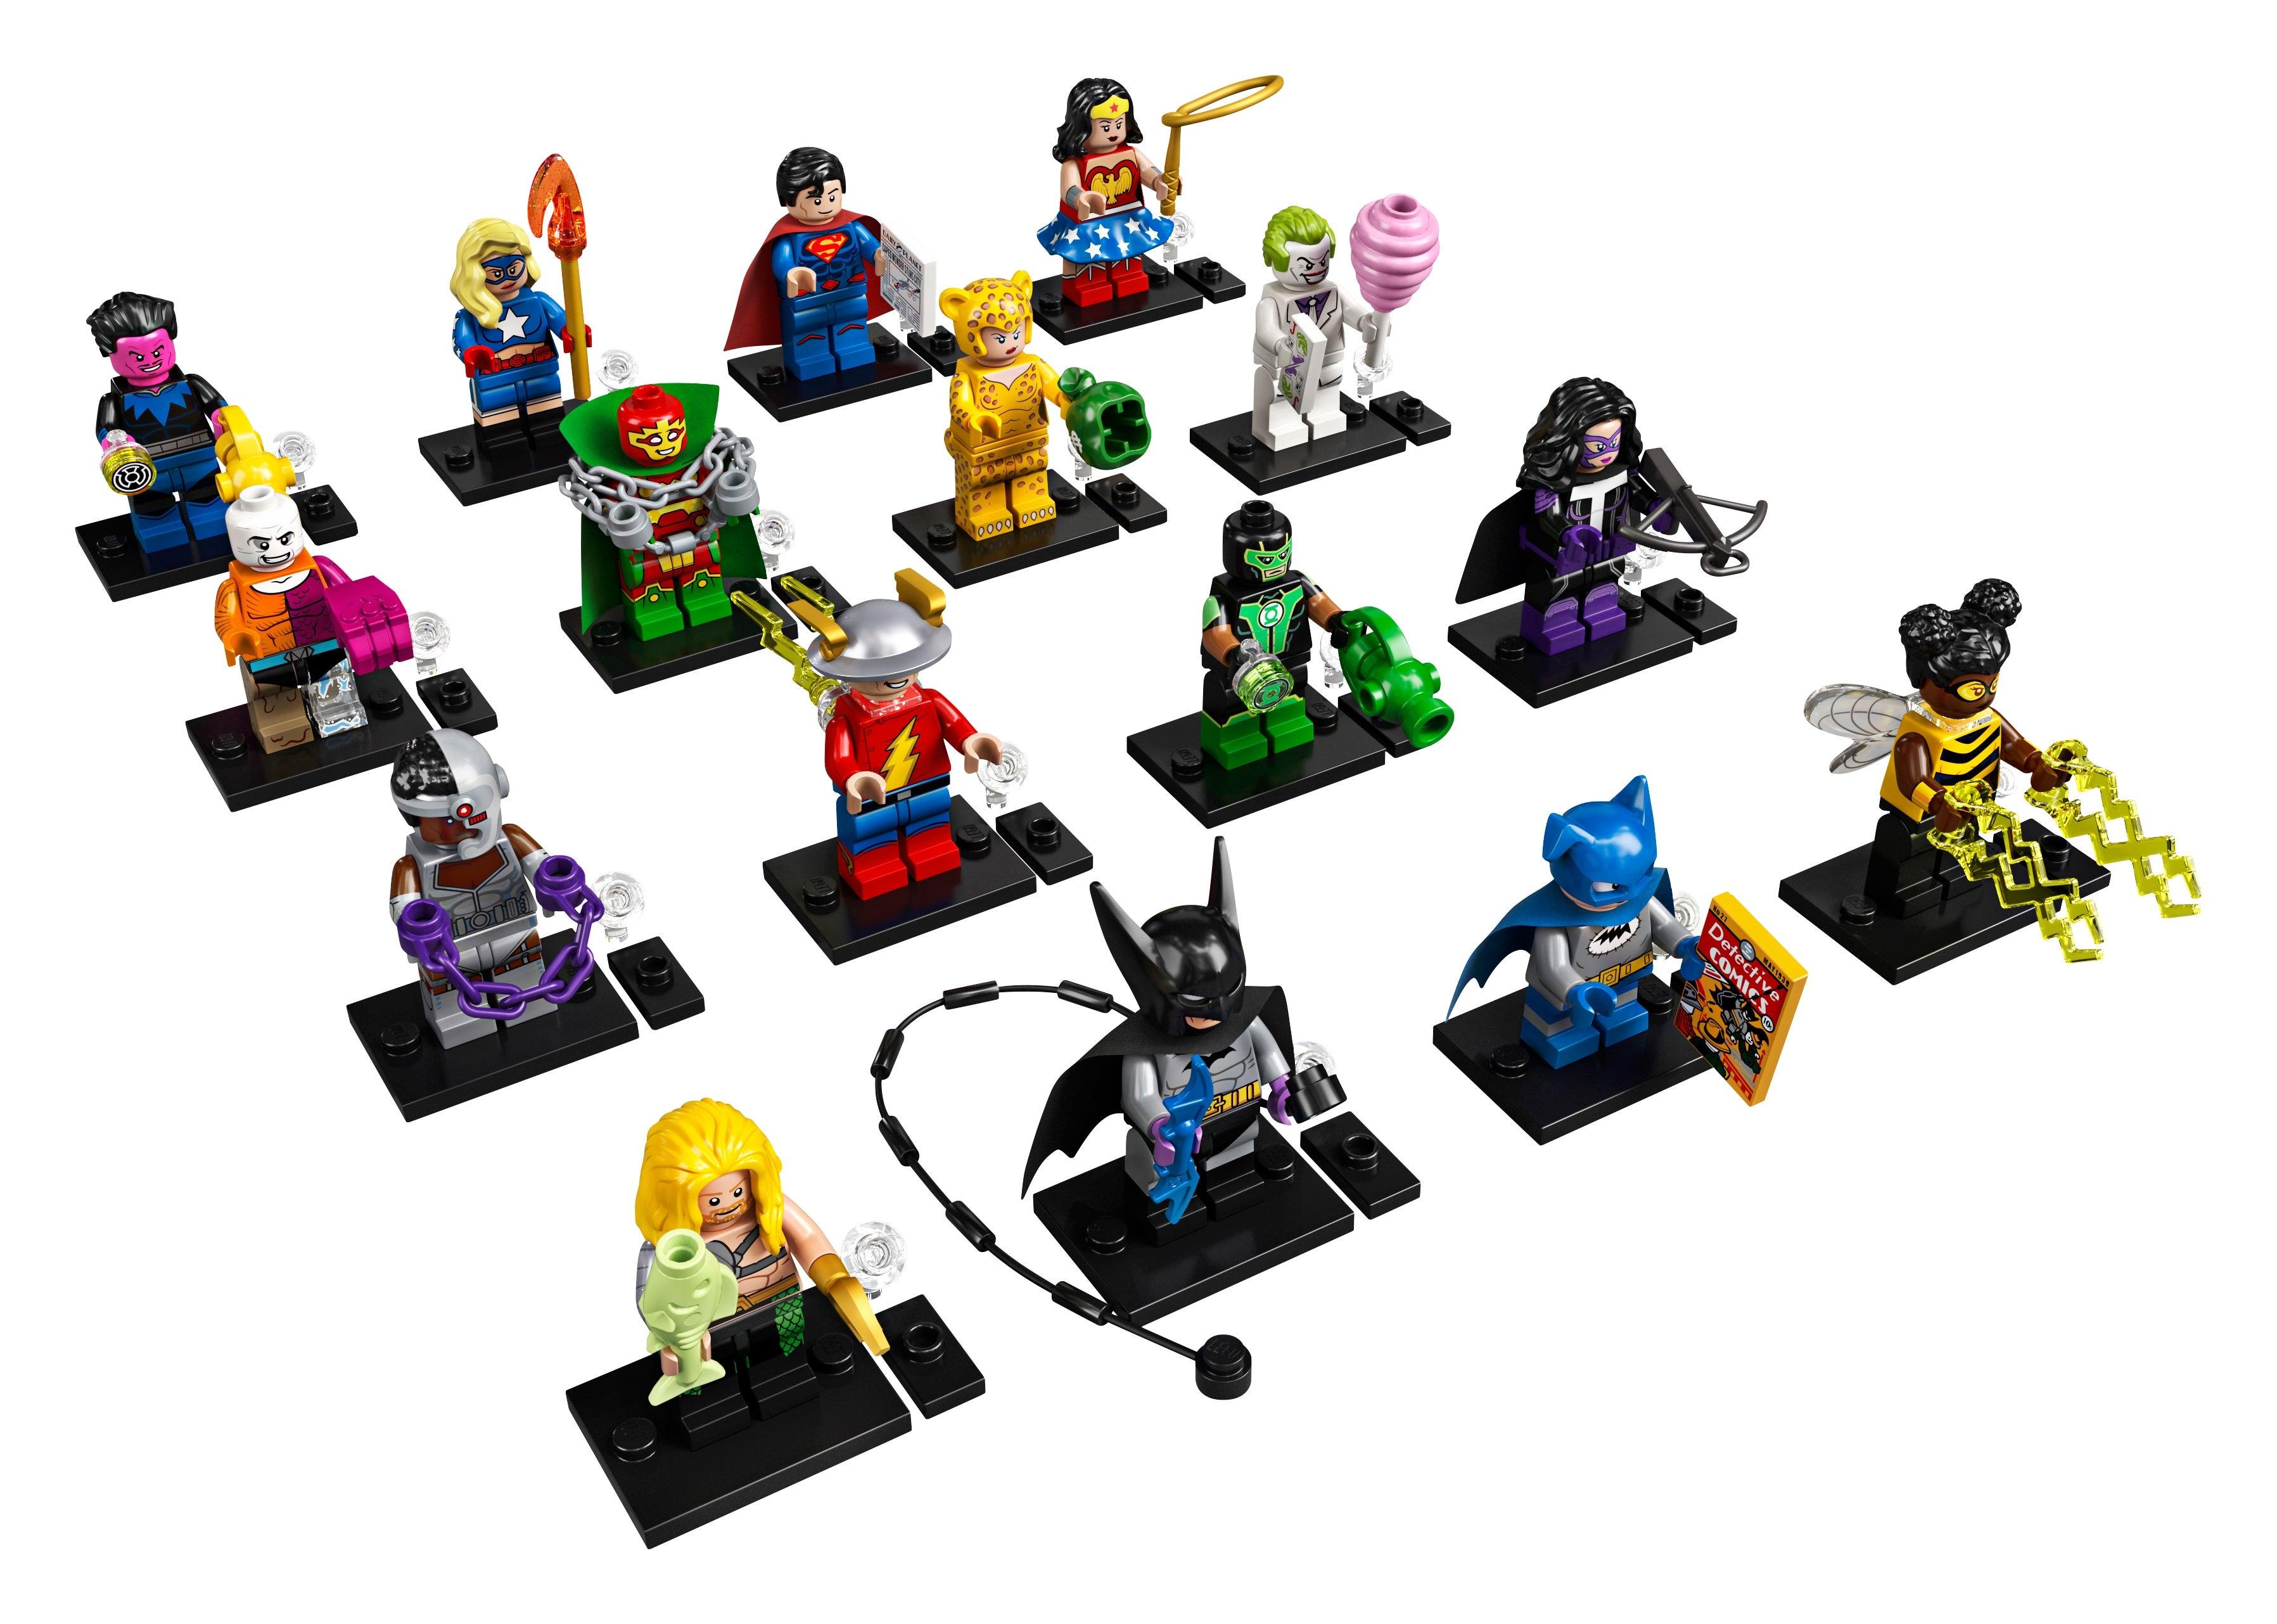 Superheroes Ninjago col City Toy story LEGO Minifigures Series Marvel